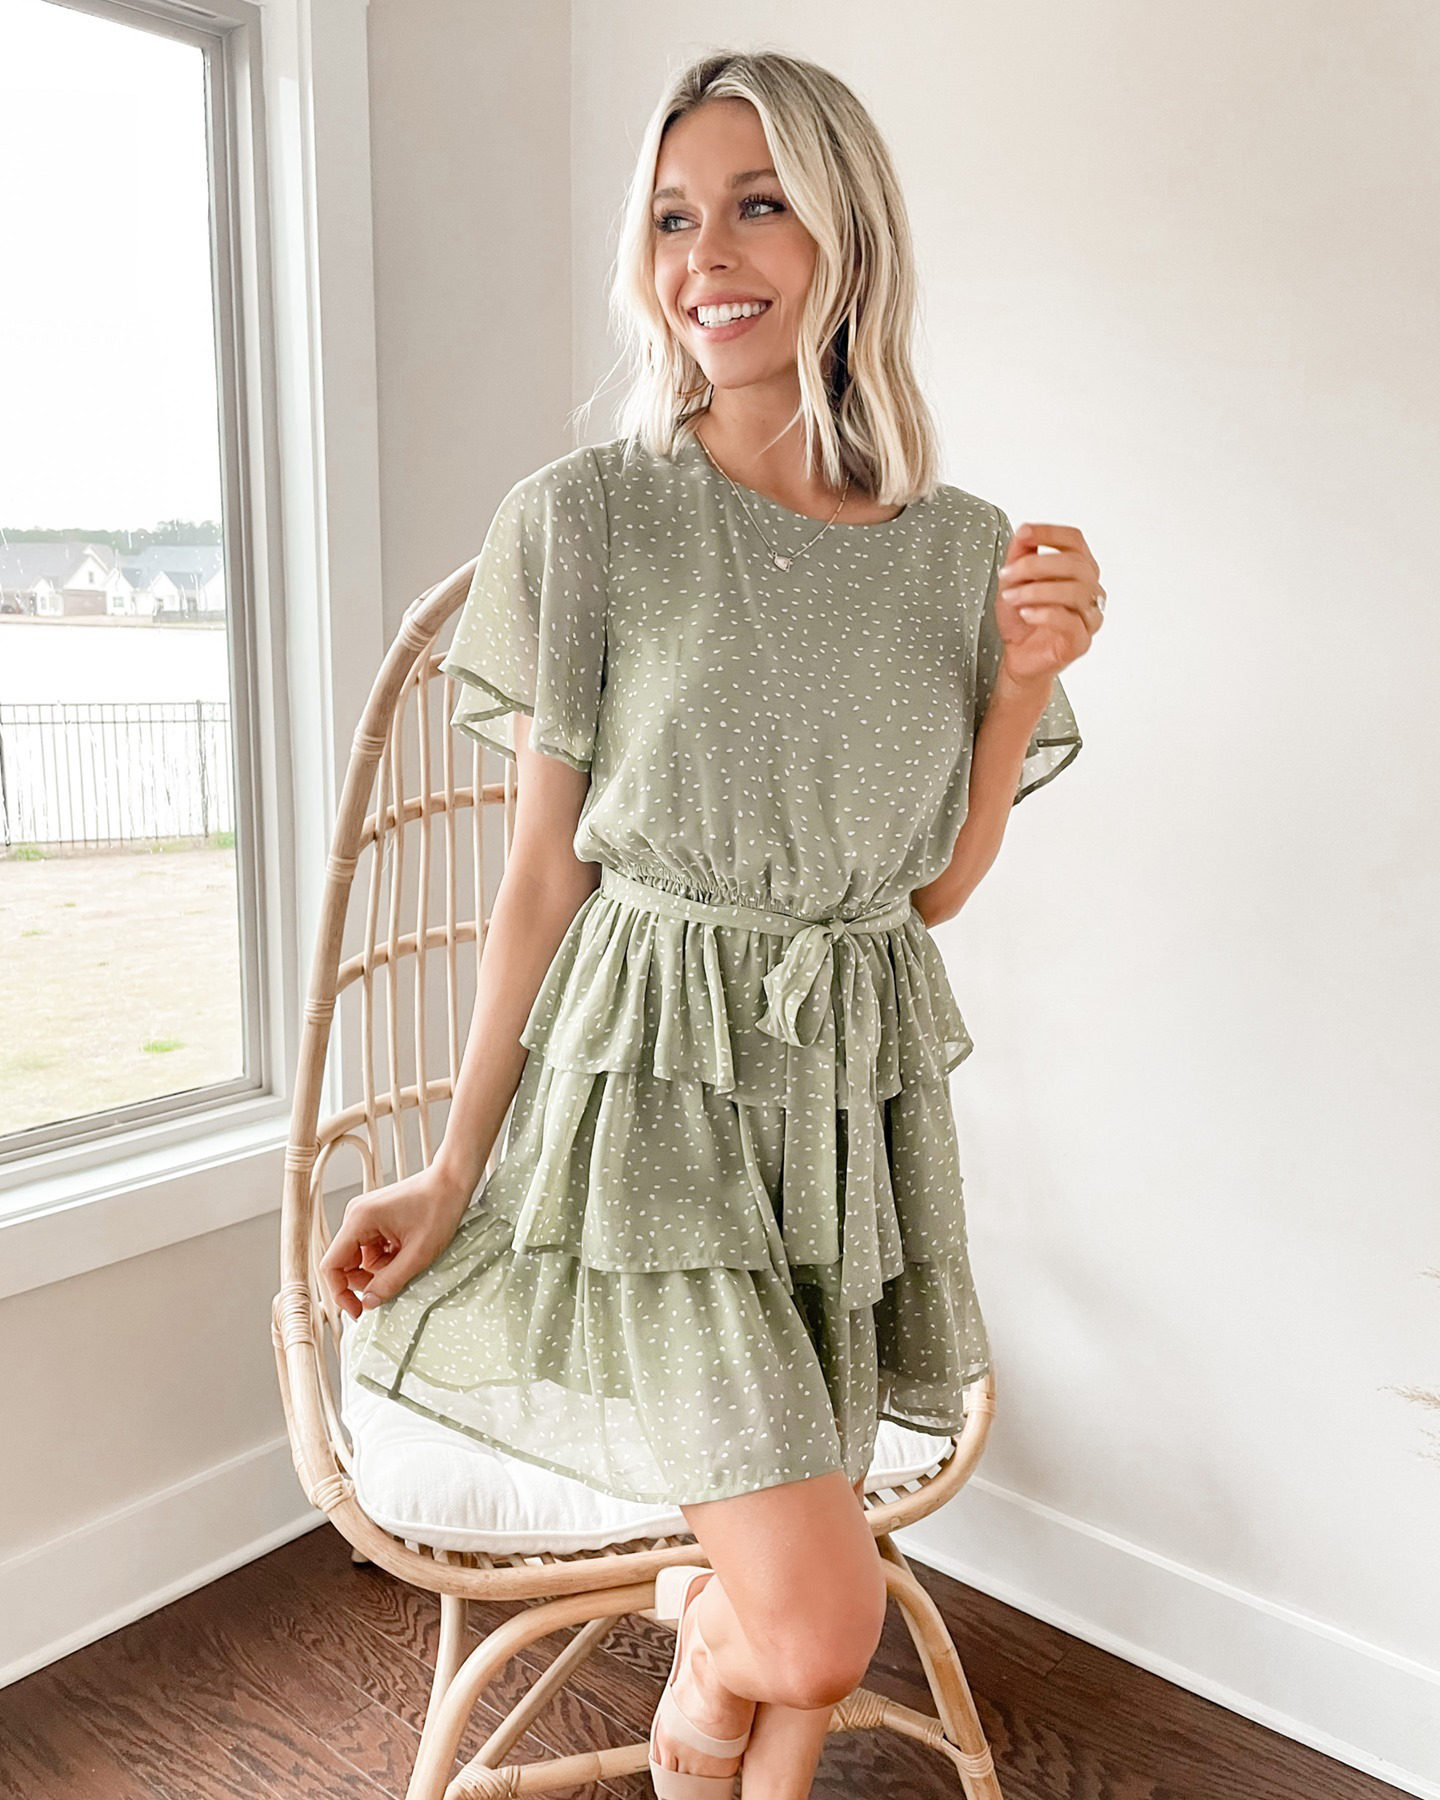 flirty summer dresses